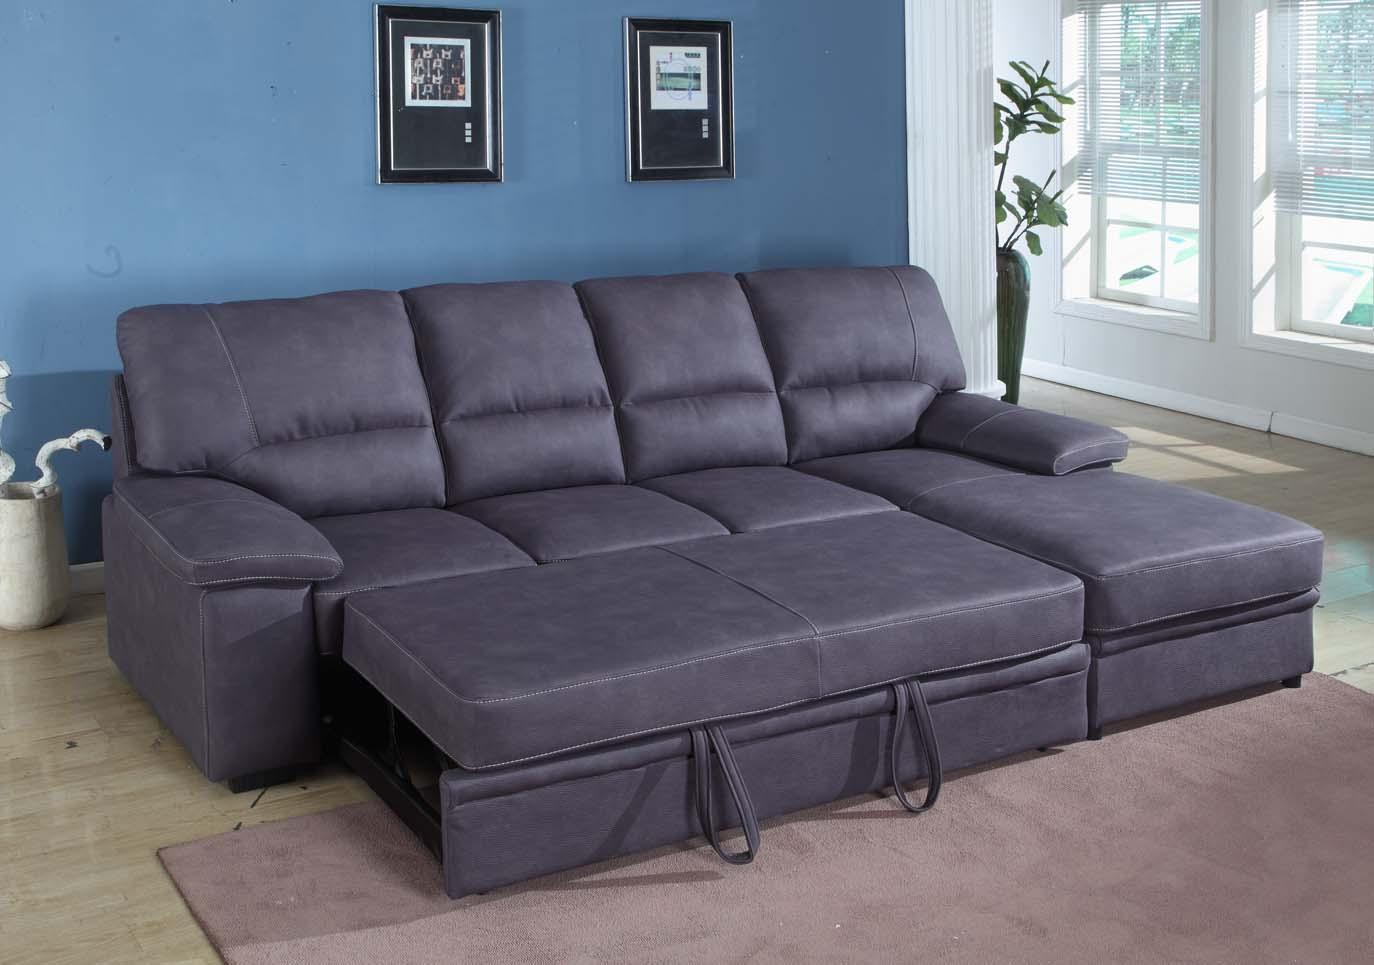 Seating furniture – sleeper sectional sofa